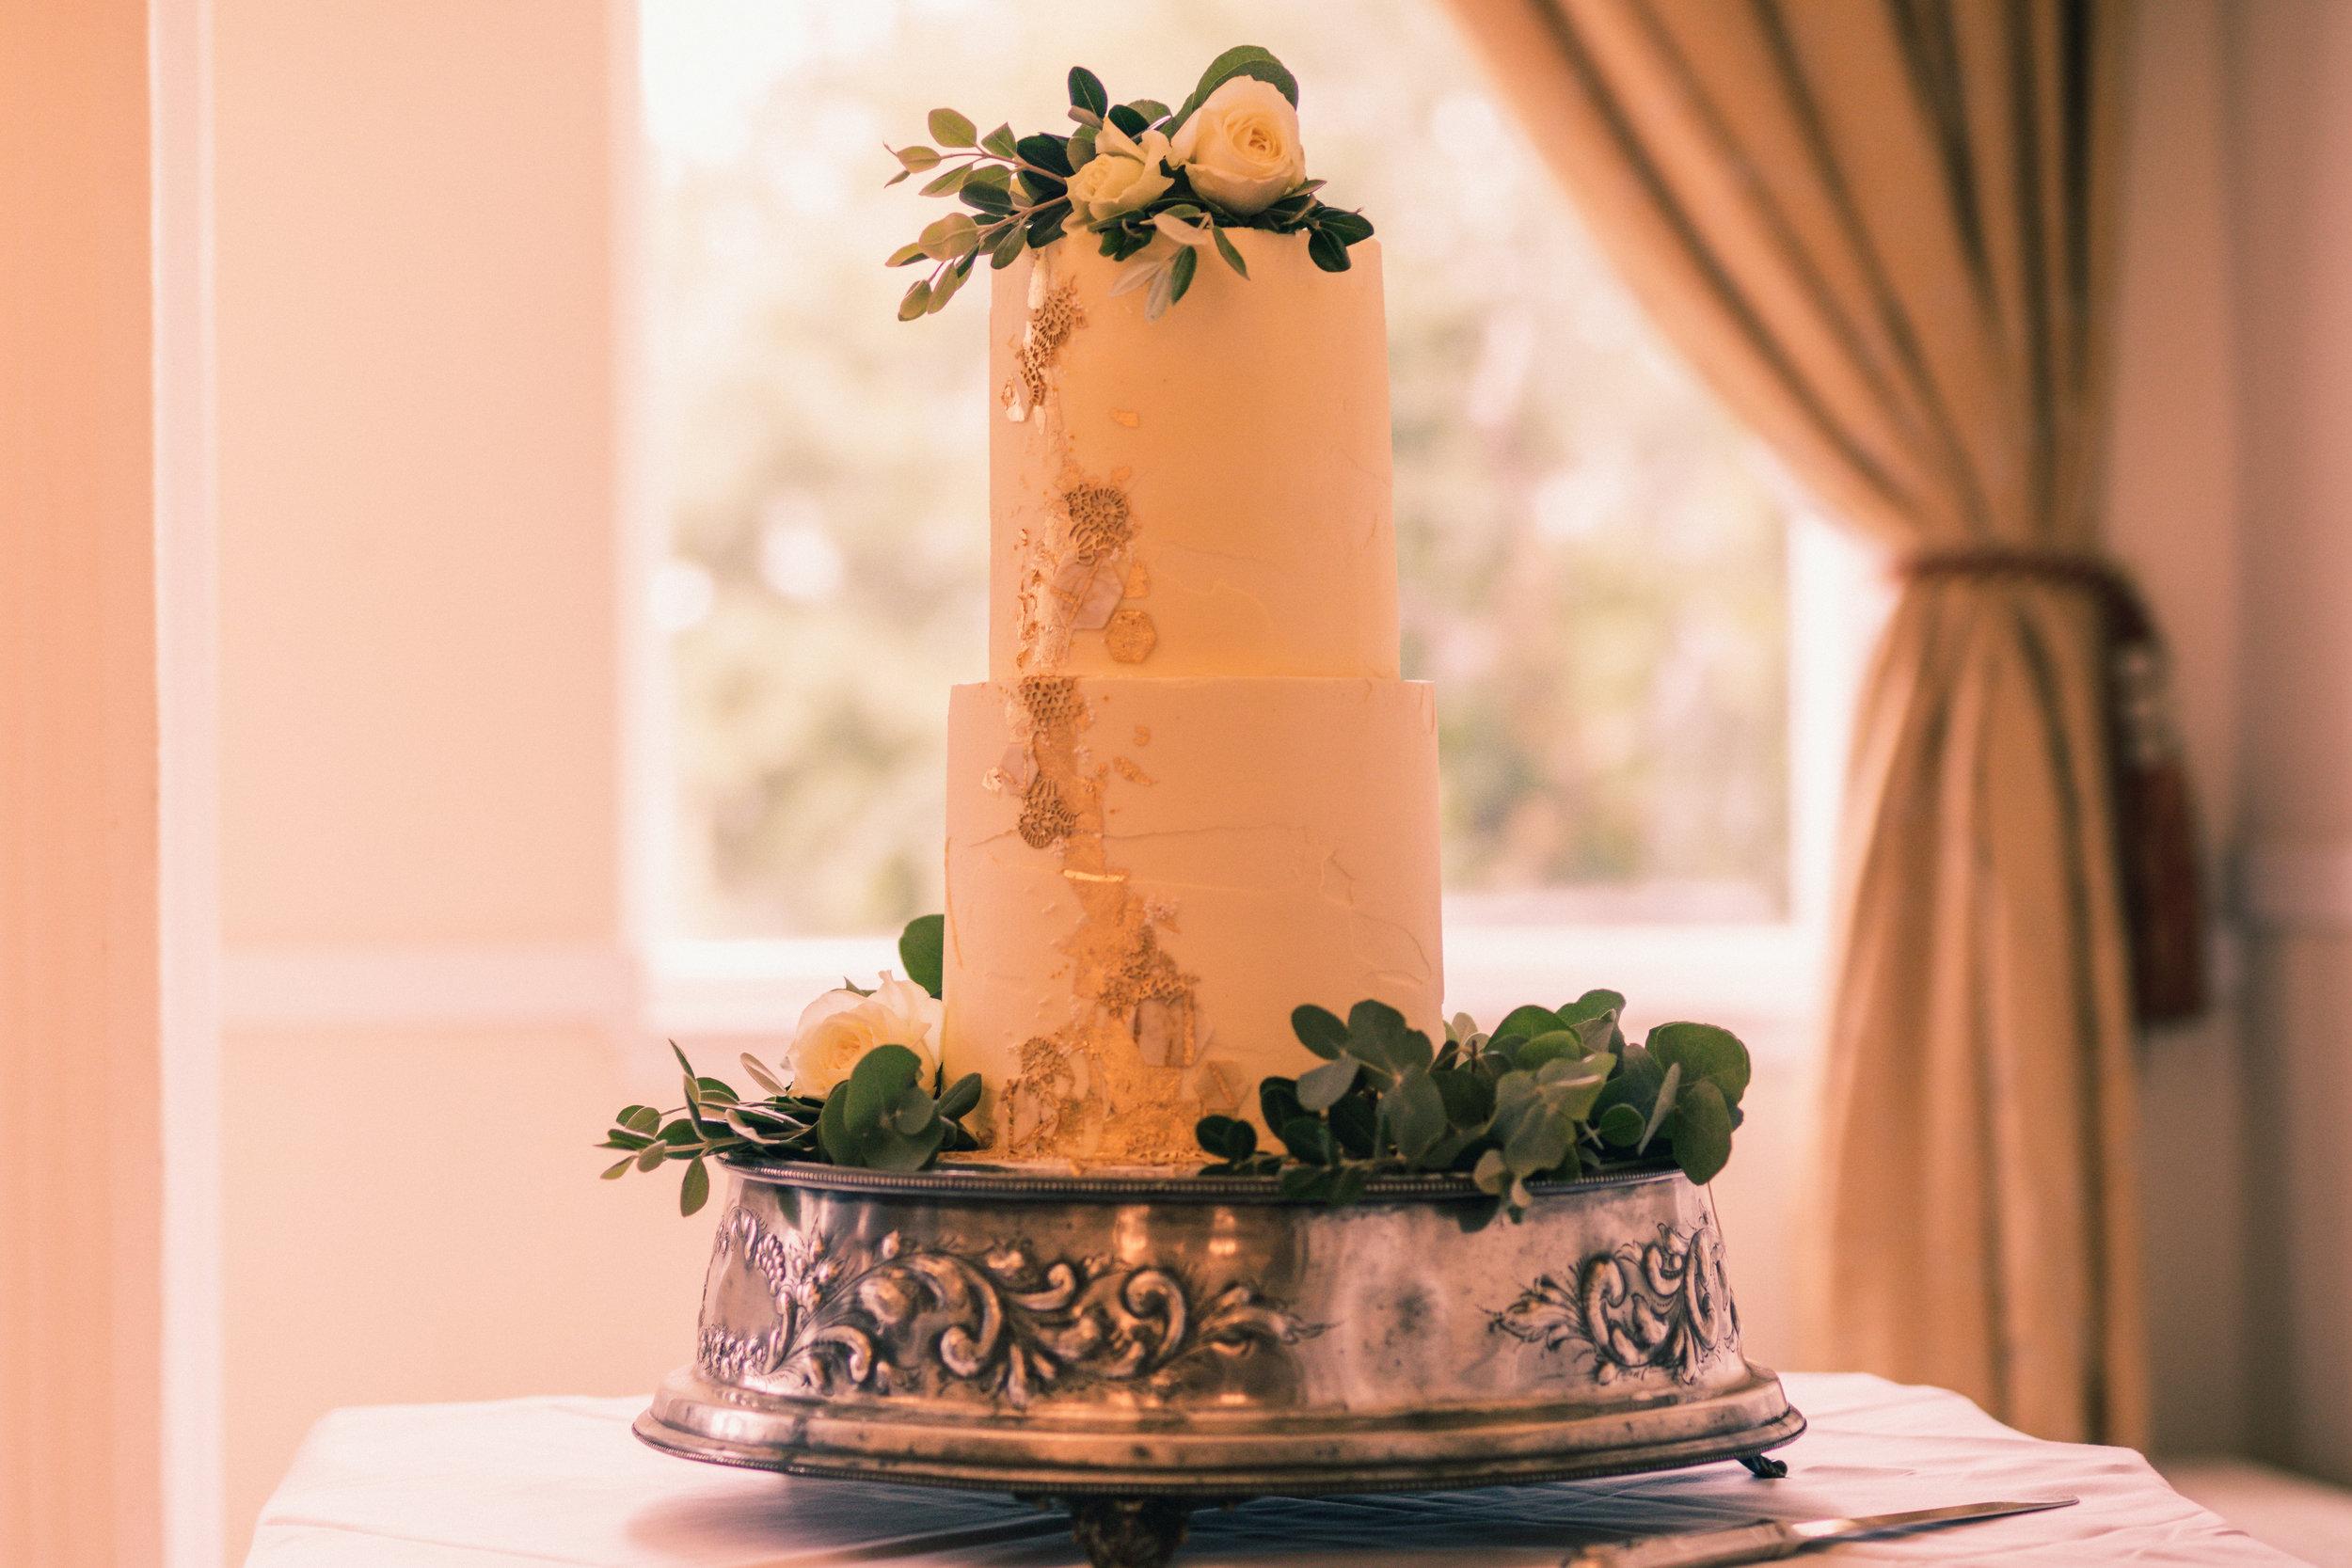 Details (cake) at Gregg & Yvonne wedding August 2018 3X2 Copyright 2018 @cursetheseeyes.jpg